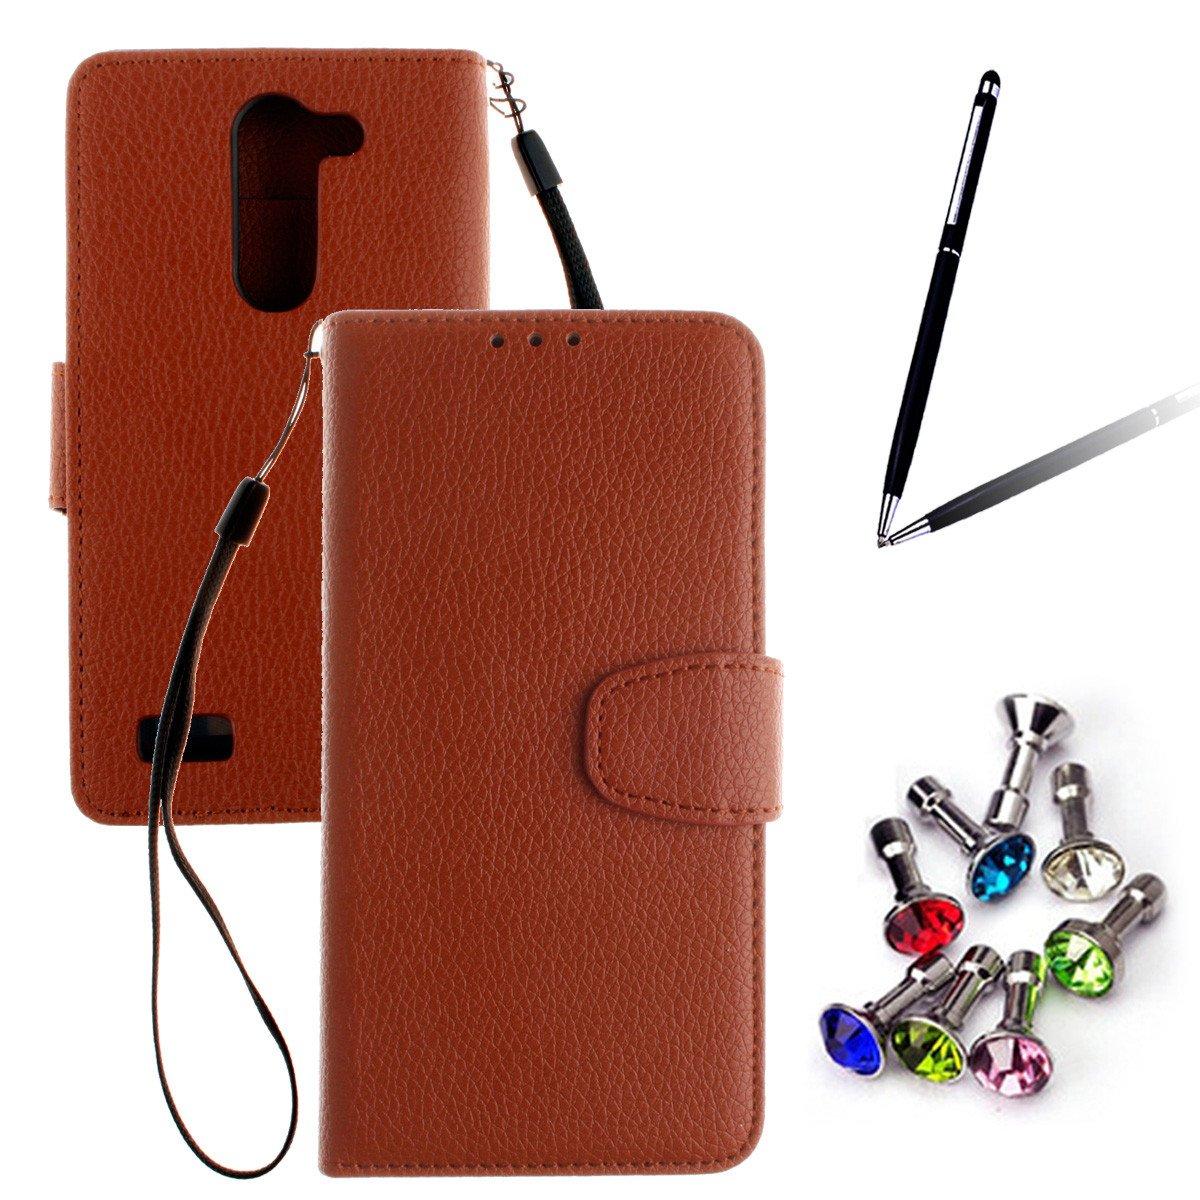 ANNNWZZD Premium PU Cuero Funda Cartera Tapa Carcasa para LG L Bello D331 D335 D337 Piel Flip Case Cover Con Ranura Para Tarjetas + Soporte + Cierre ...